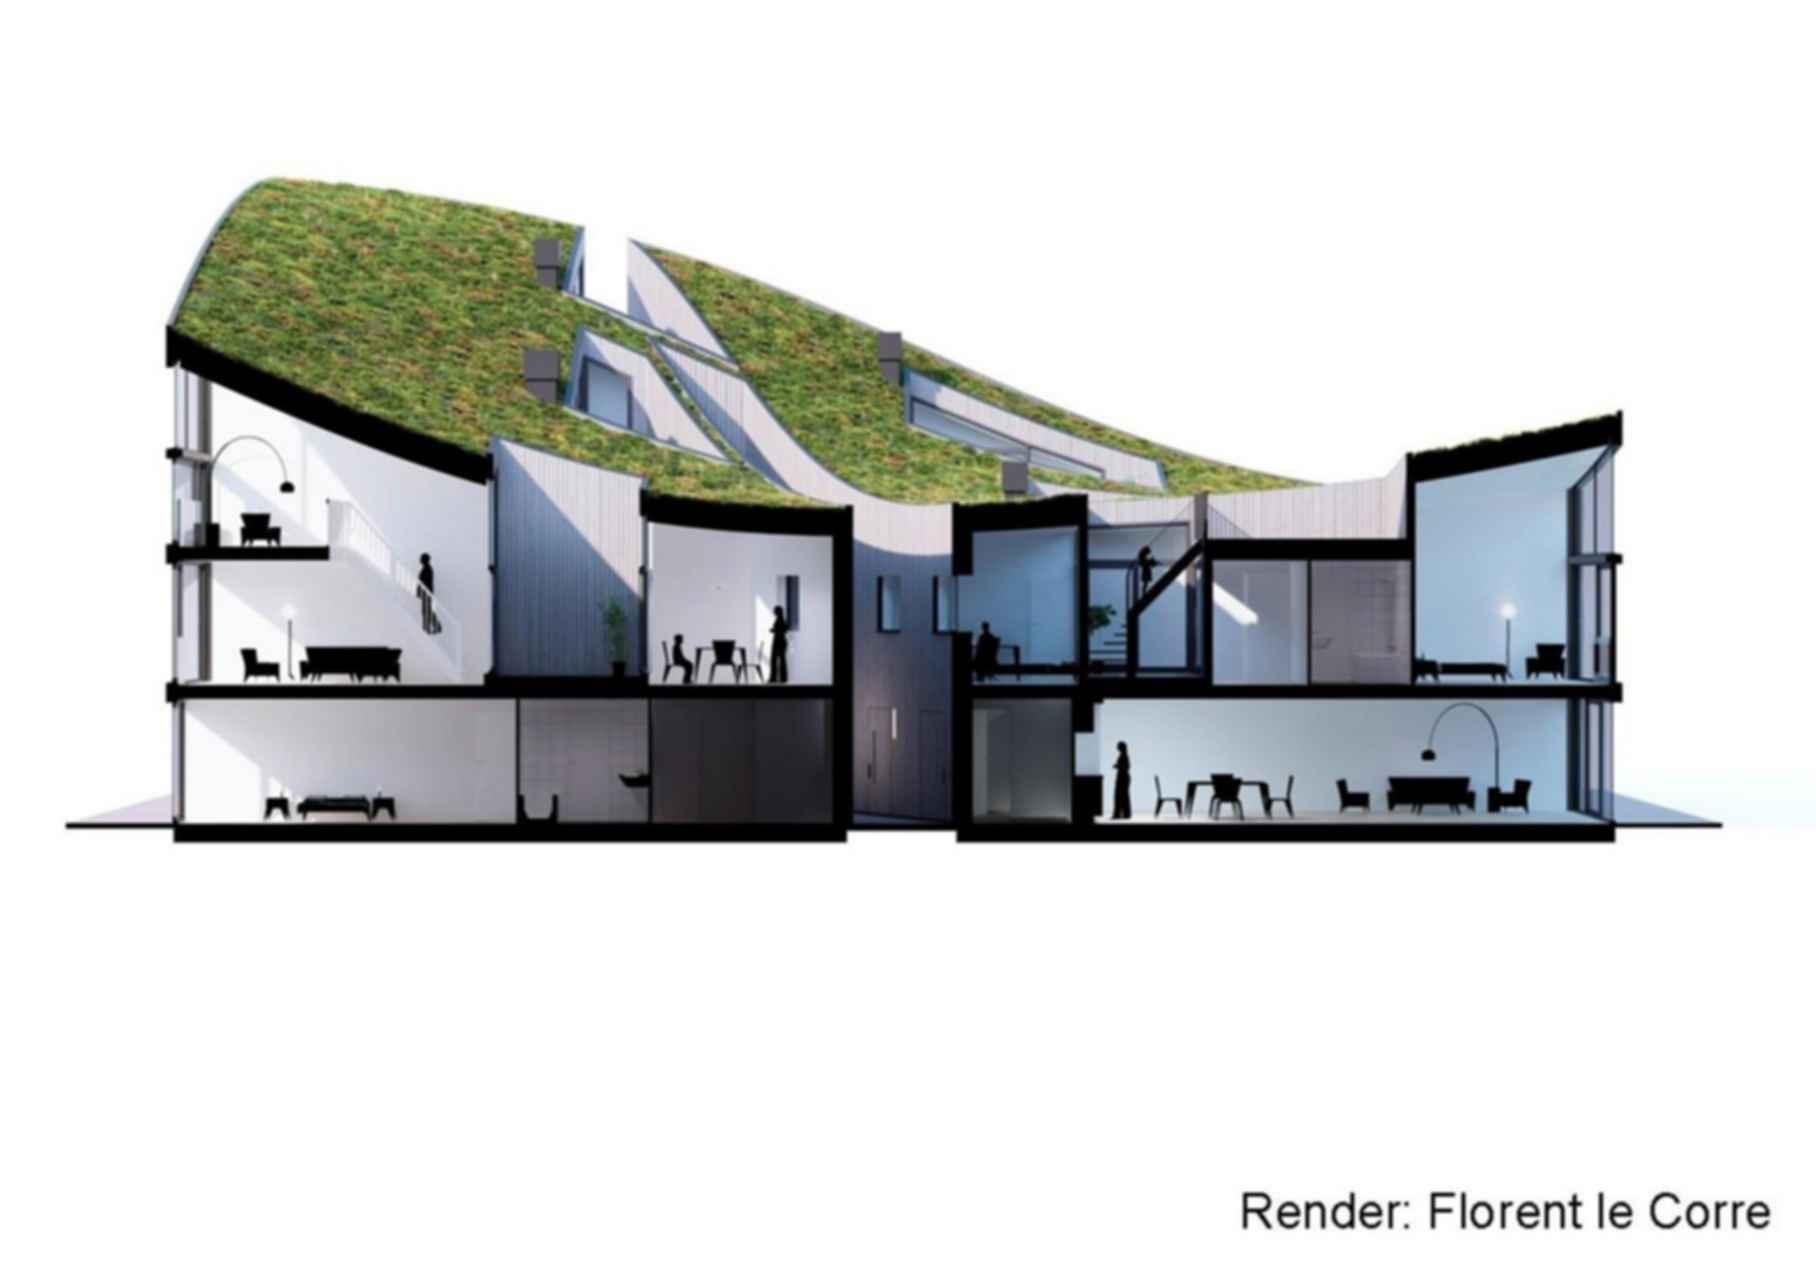 Funnen Blok K, Funenpark - Concept Design